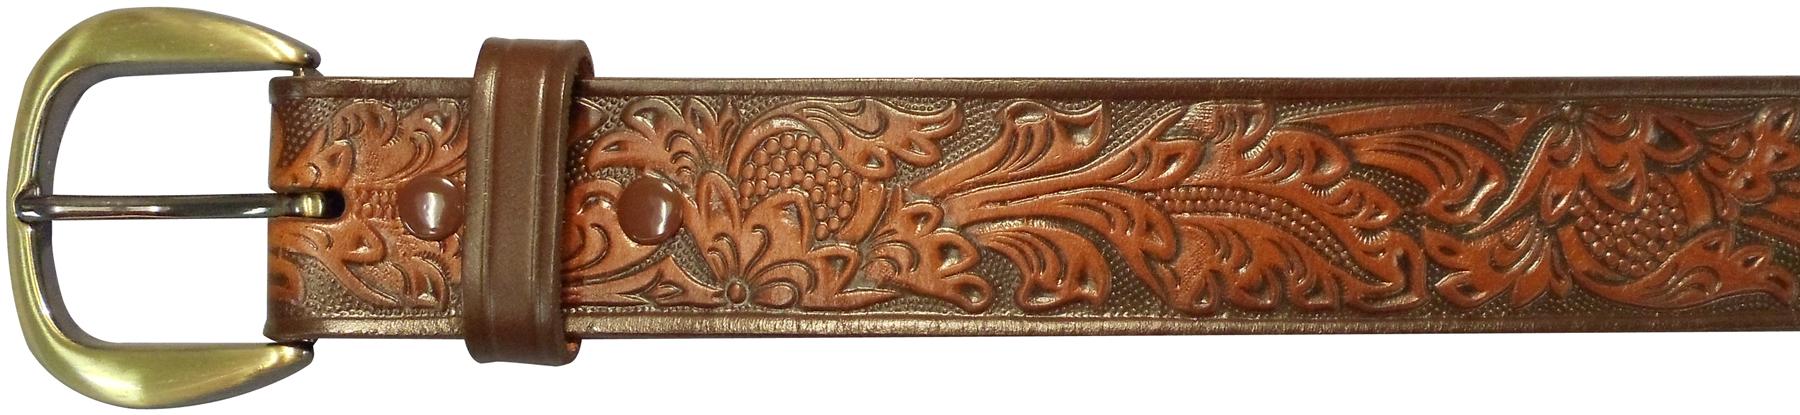 "10610110232 - 32"" Brown Leather Embossed Belt"